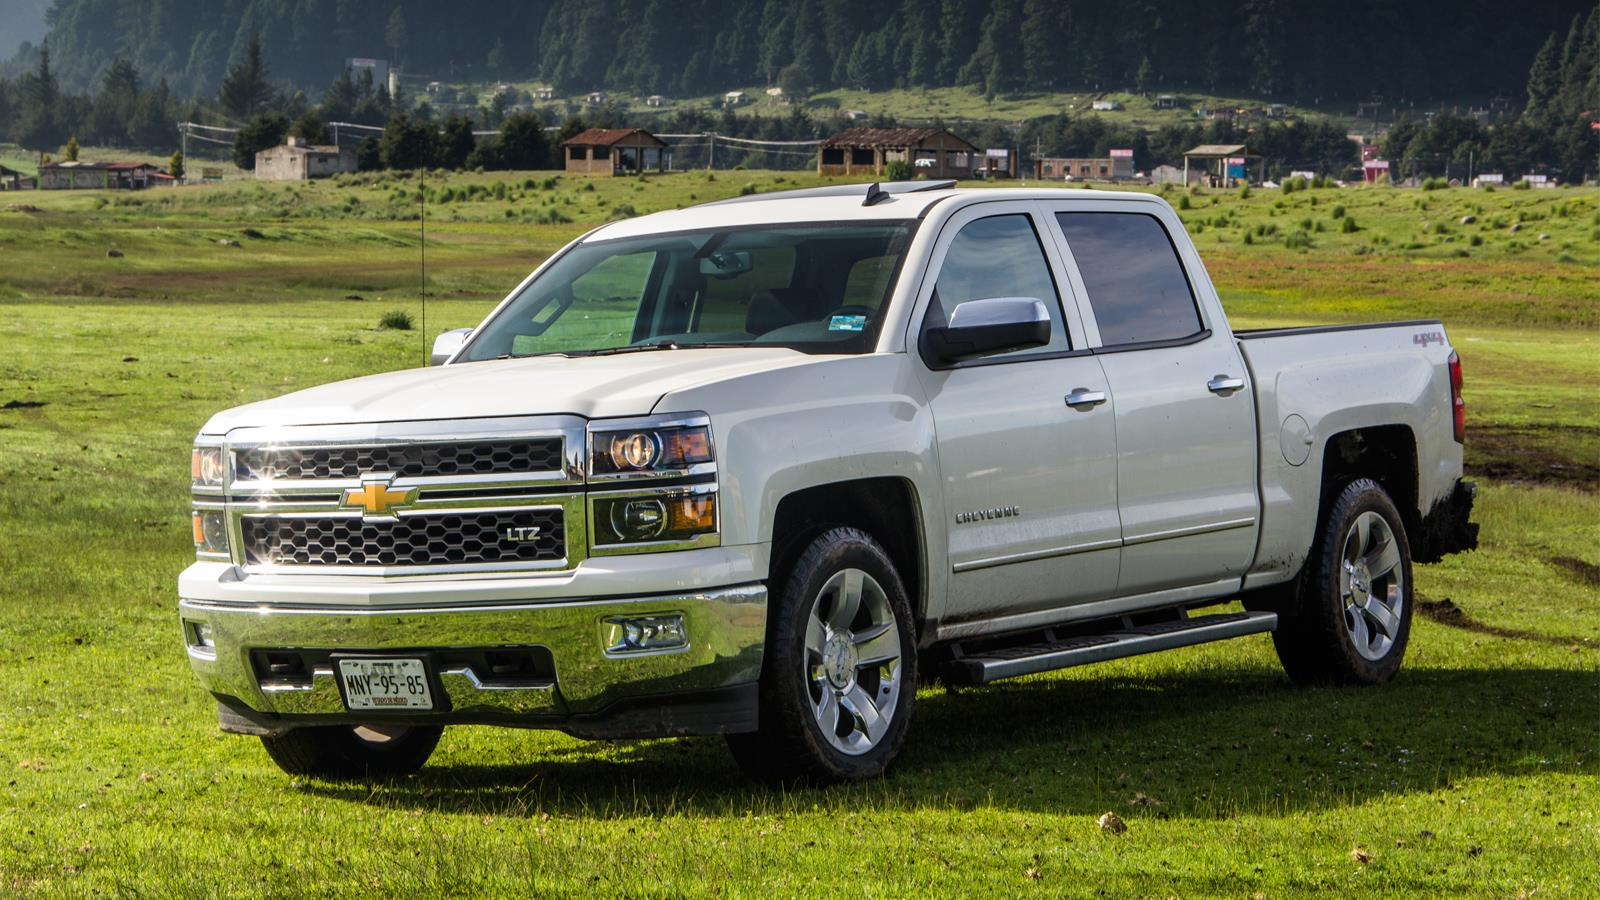 Chevrolet Cheyenne 2014 - Autocosmos.com